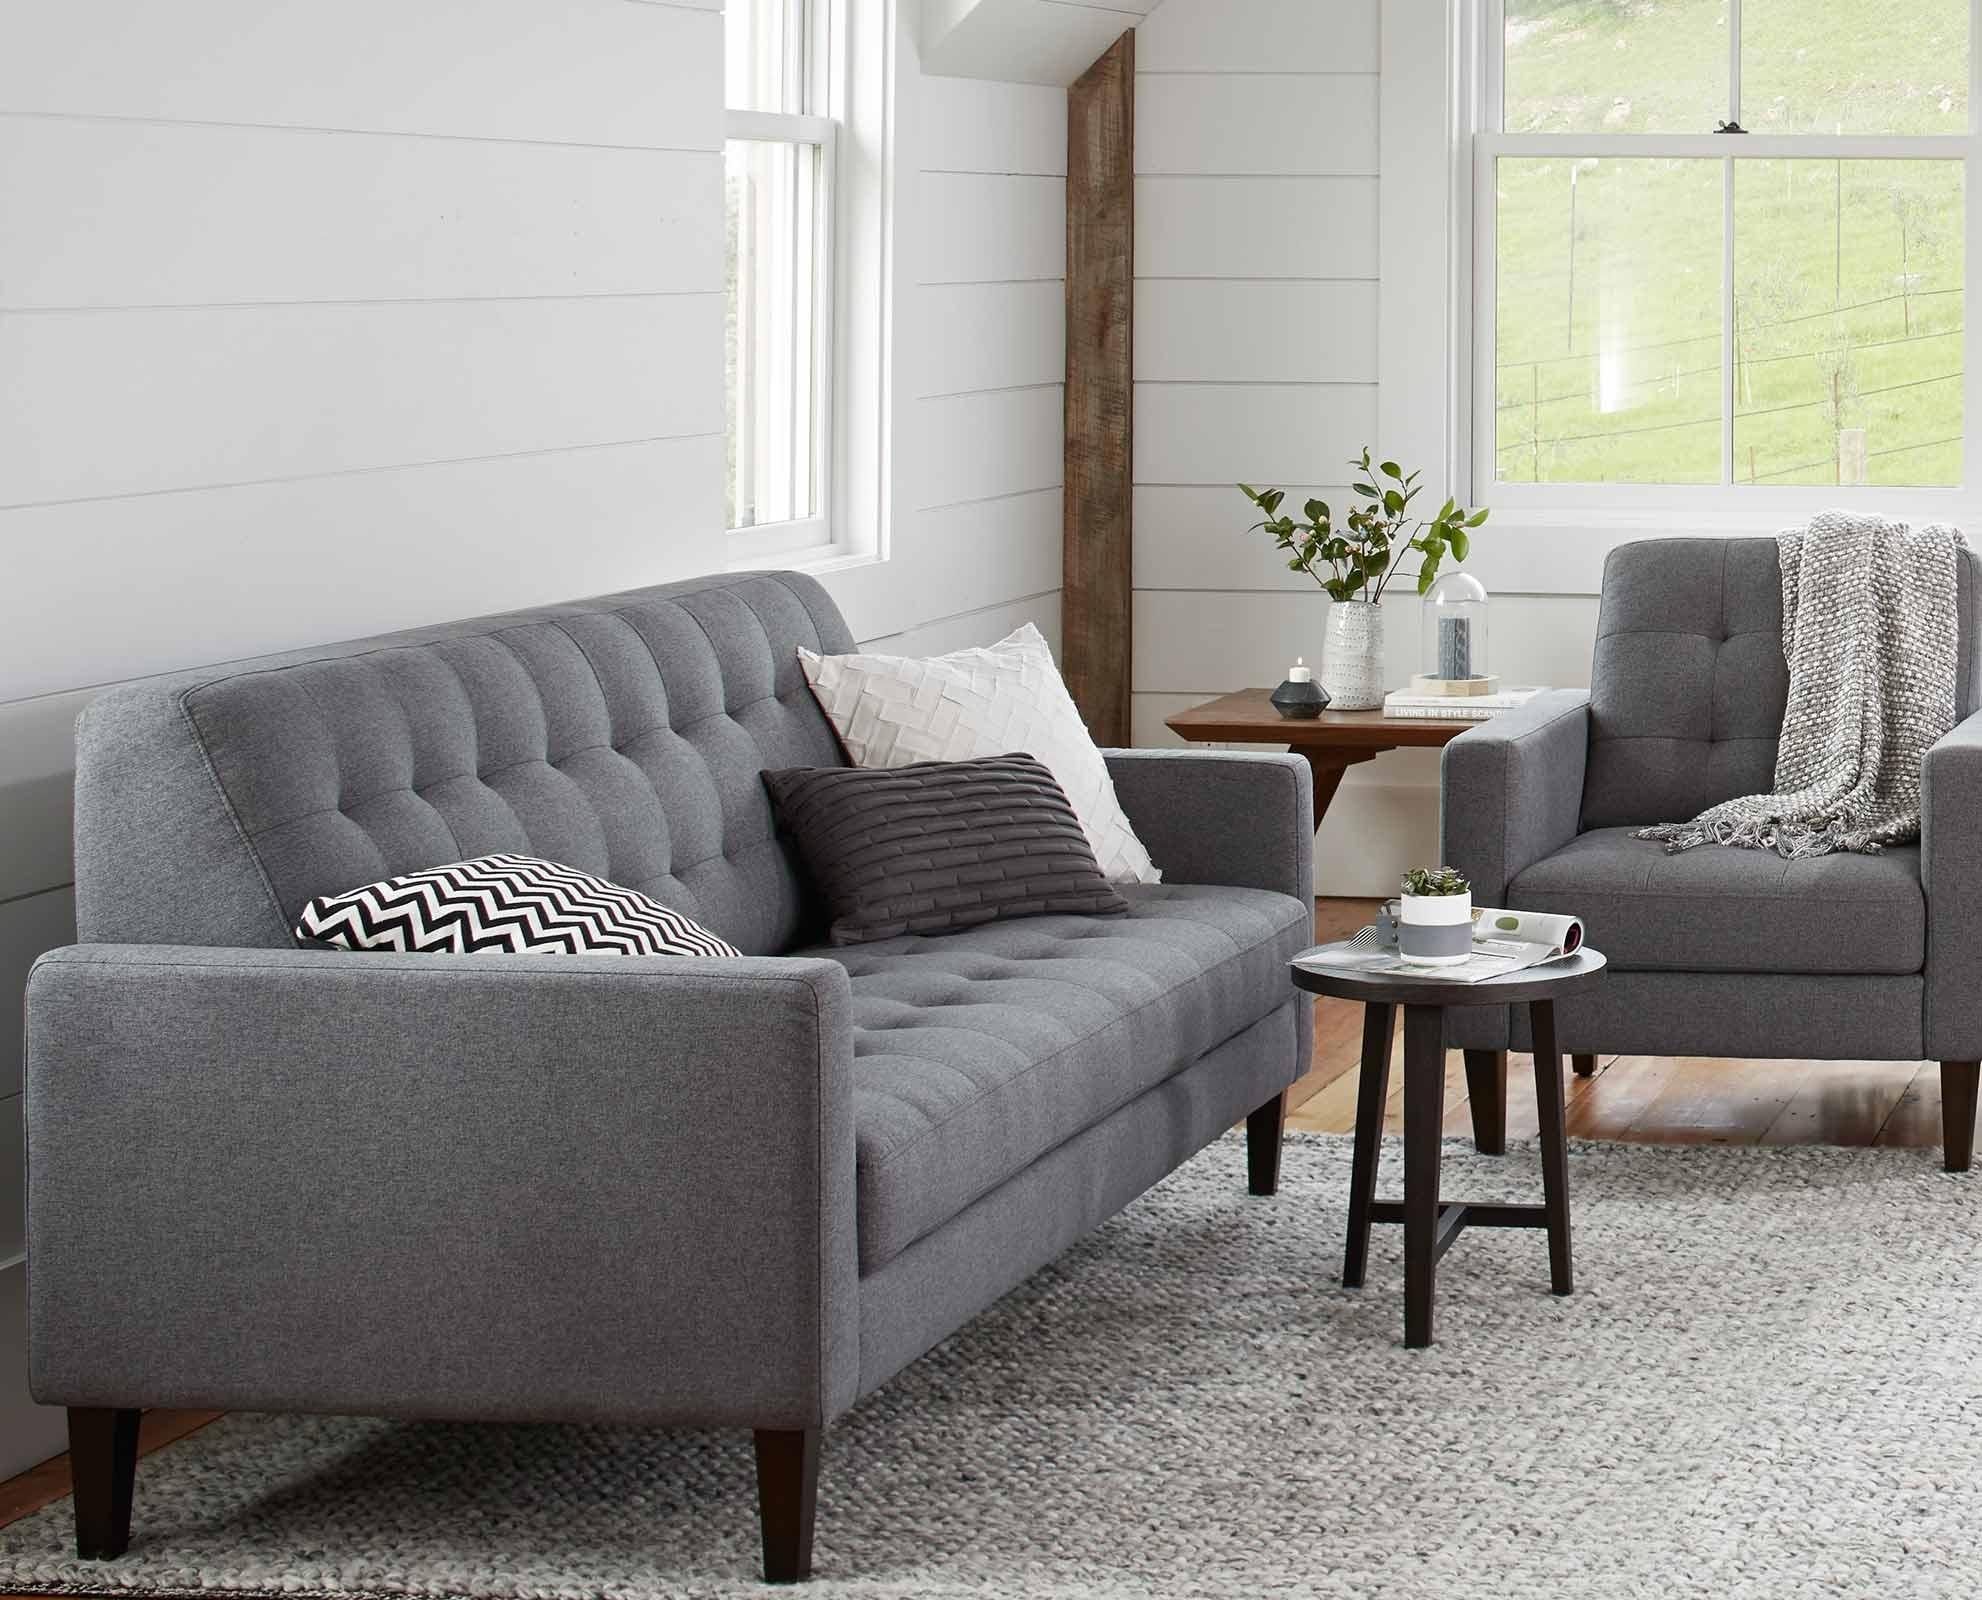 Furniture: Modern Living Room Sofas Designtillary Sofa — Spy For Dania Sectional Sofas (Image 3 of 10)